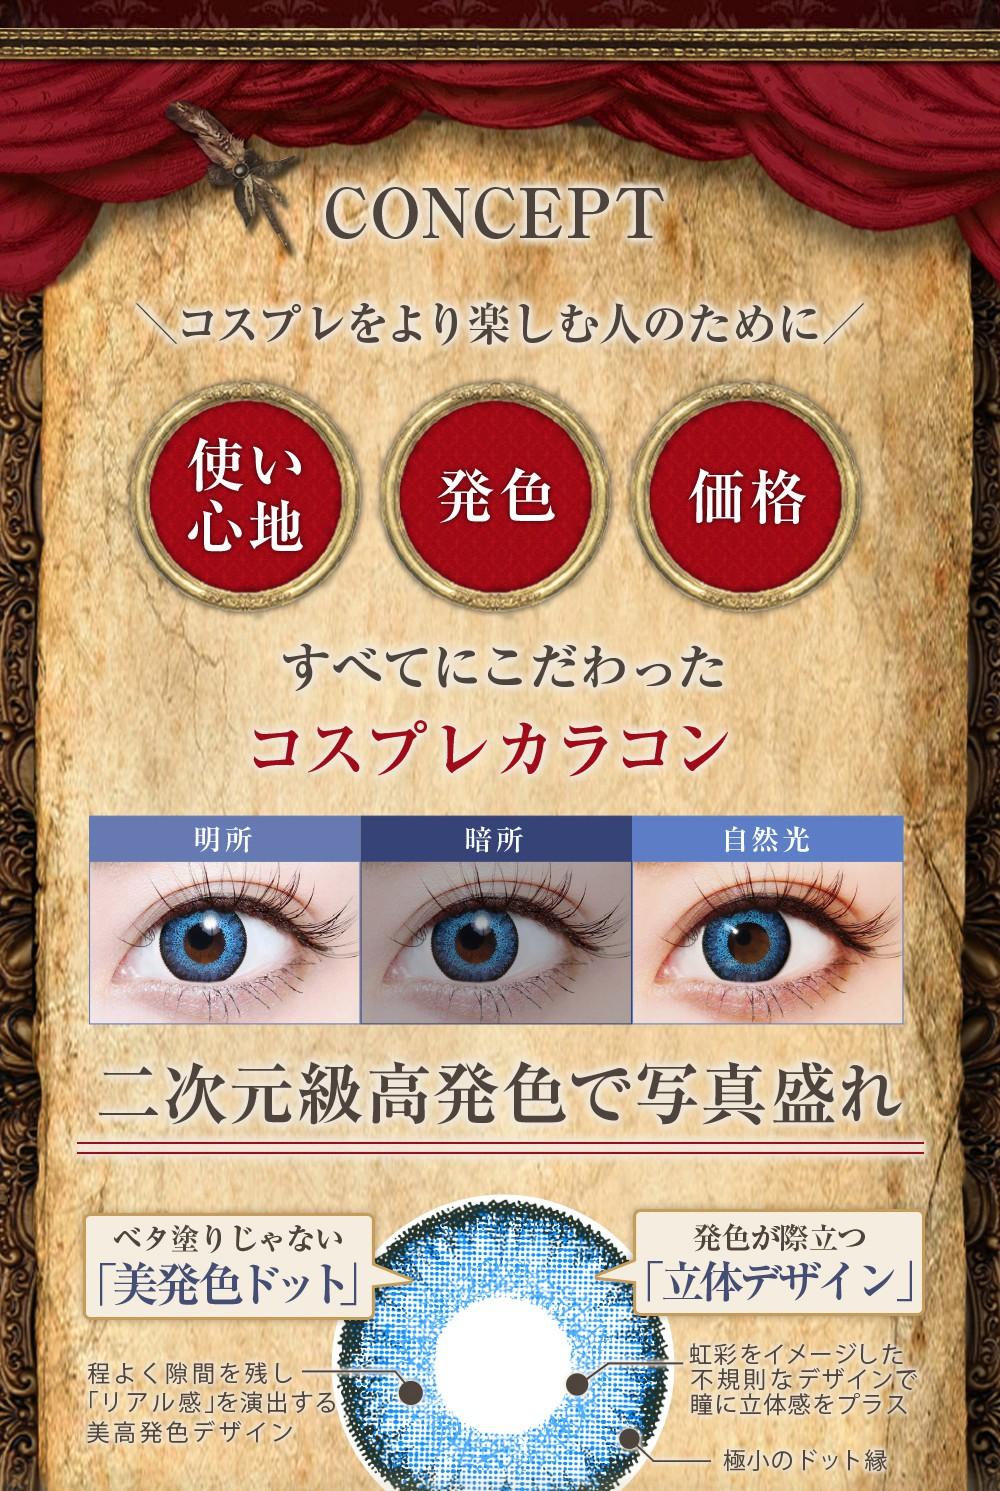 「Edel Series(エーデルシリーズ)」コンセプト